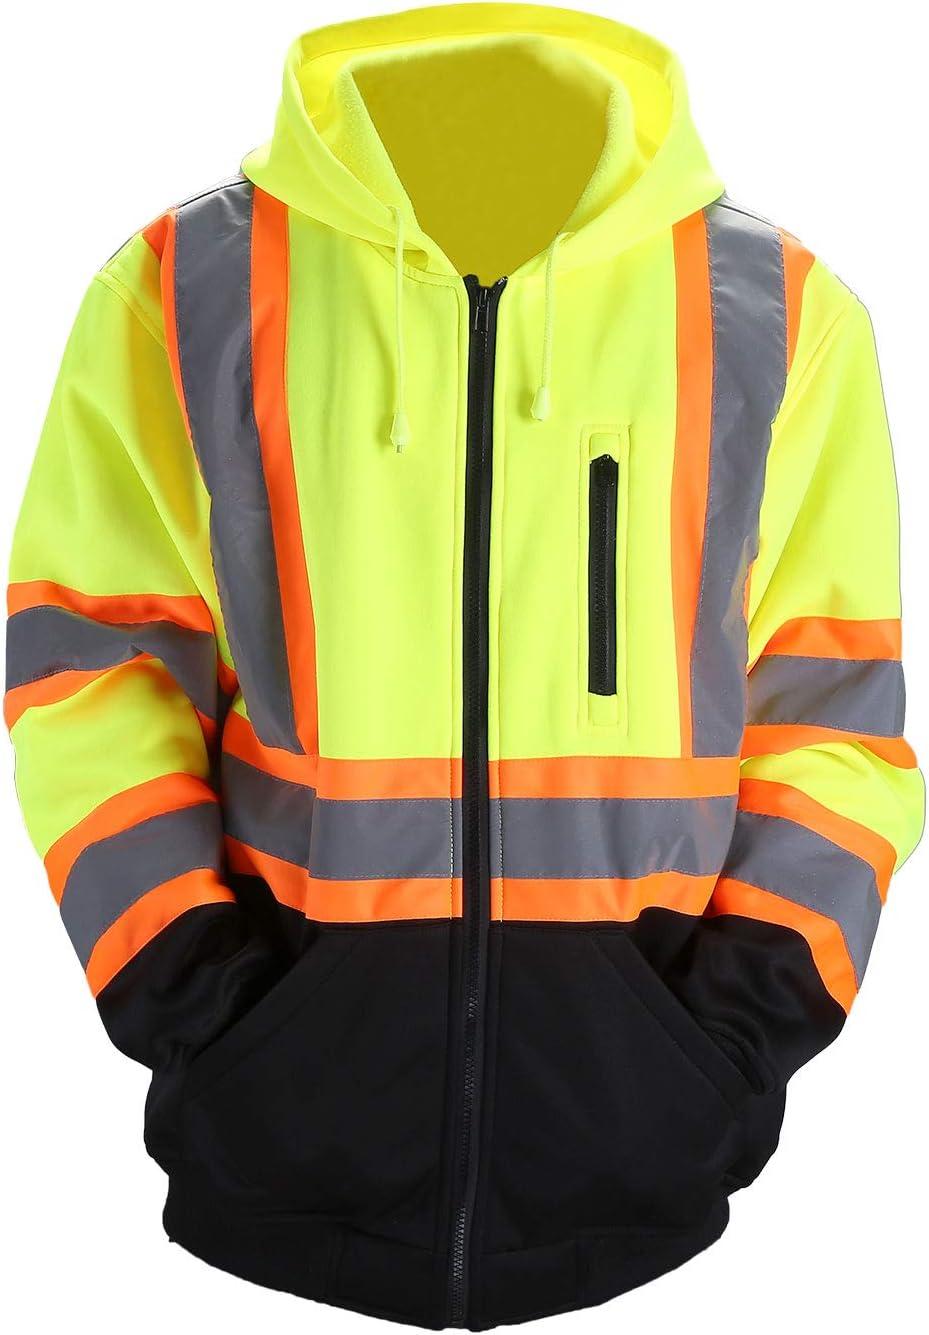 FONIRRA Hi-Viz Safety Full-Zip Hoodie Sweatshirt with Black Bottom,High Visibility ANSI Class 3 Fleece Hooded Jumper Workwear for Men Yellow,S